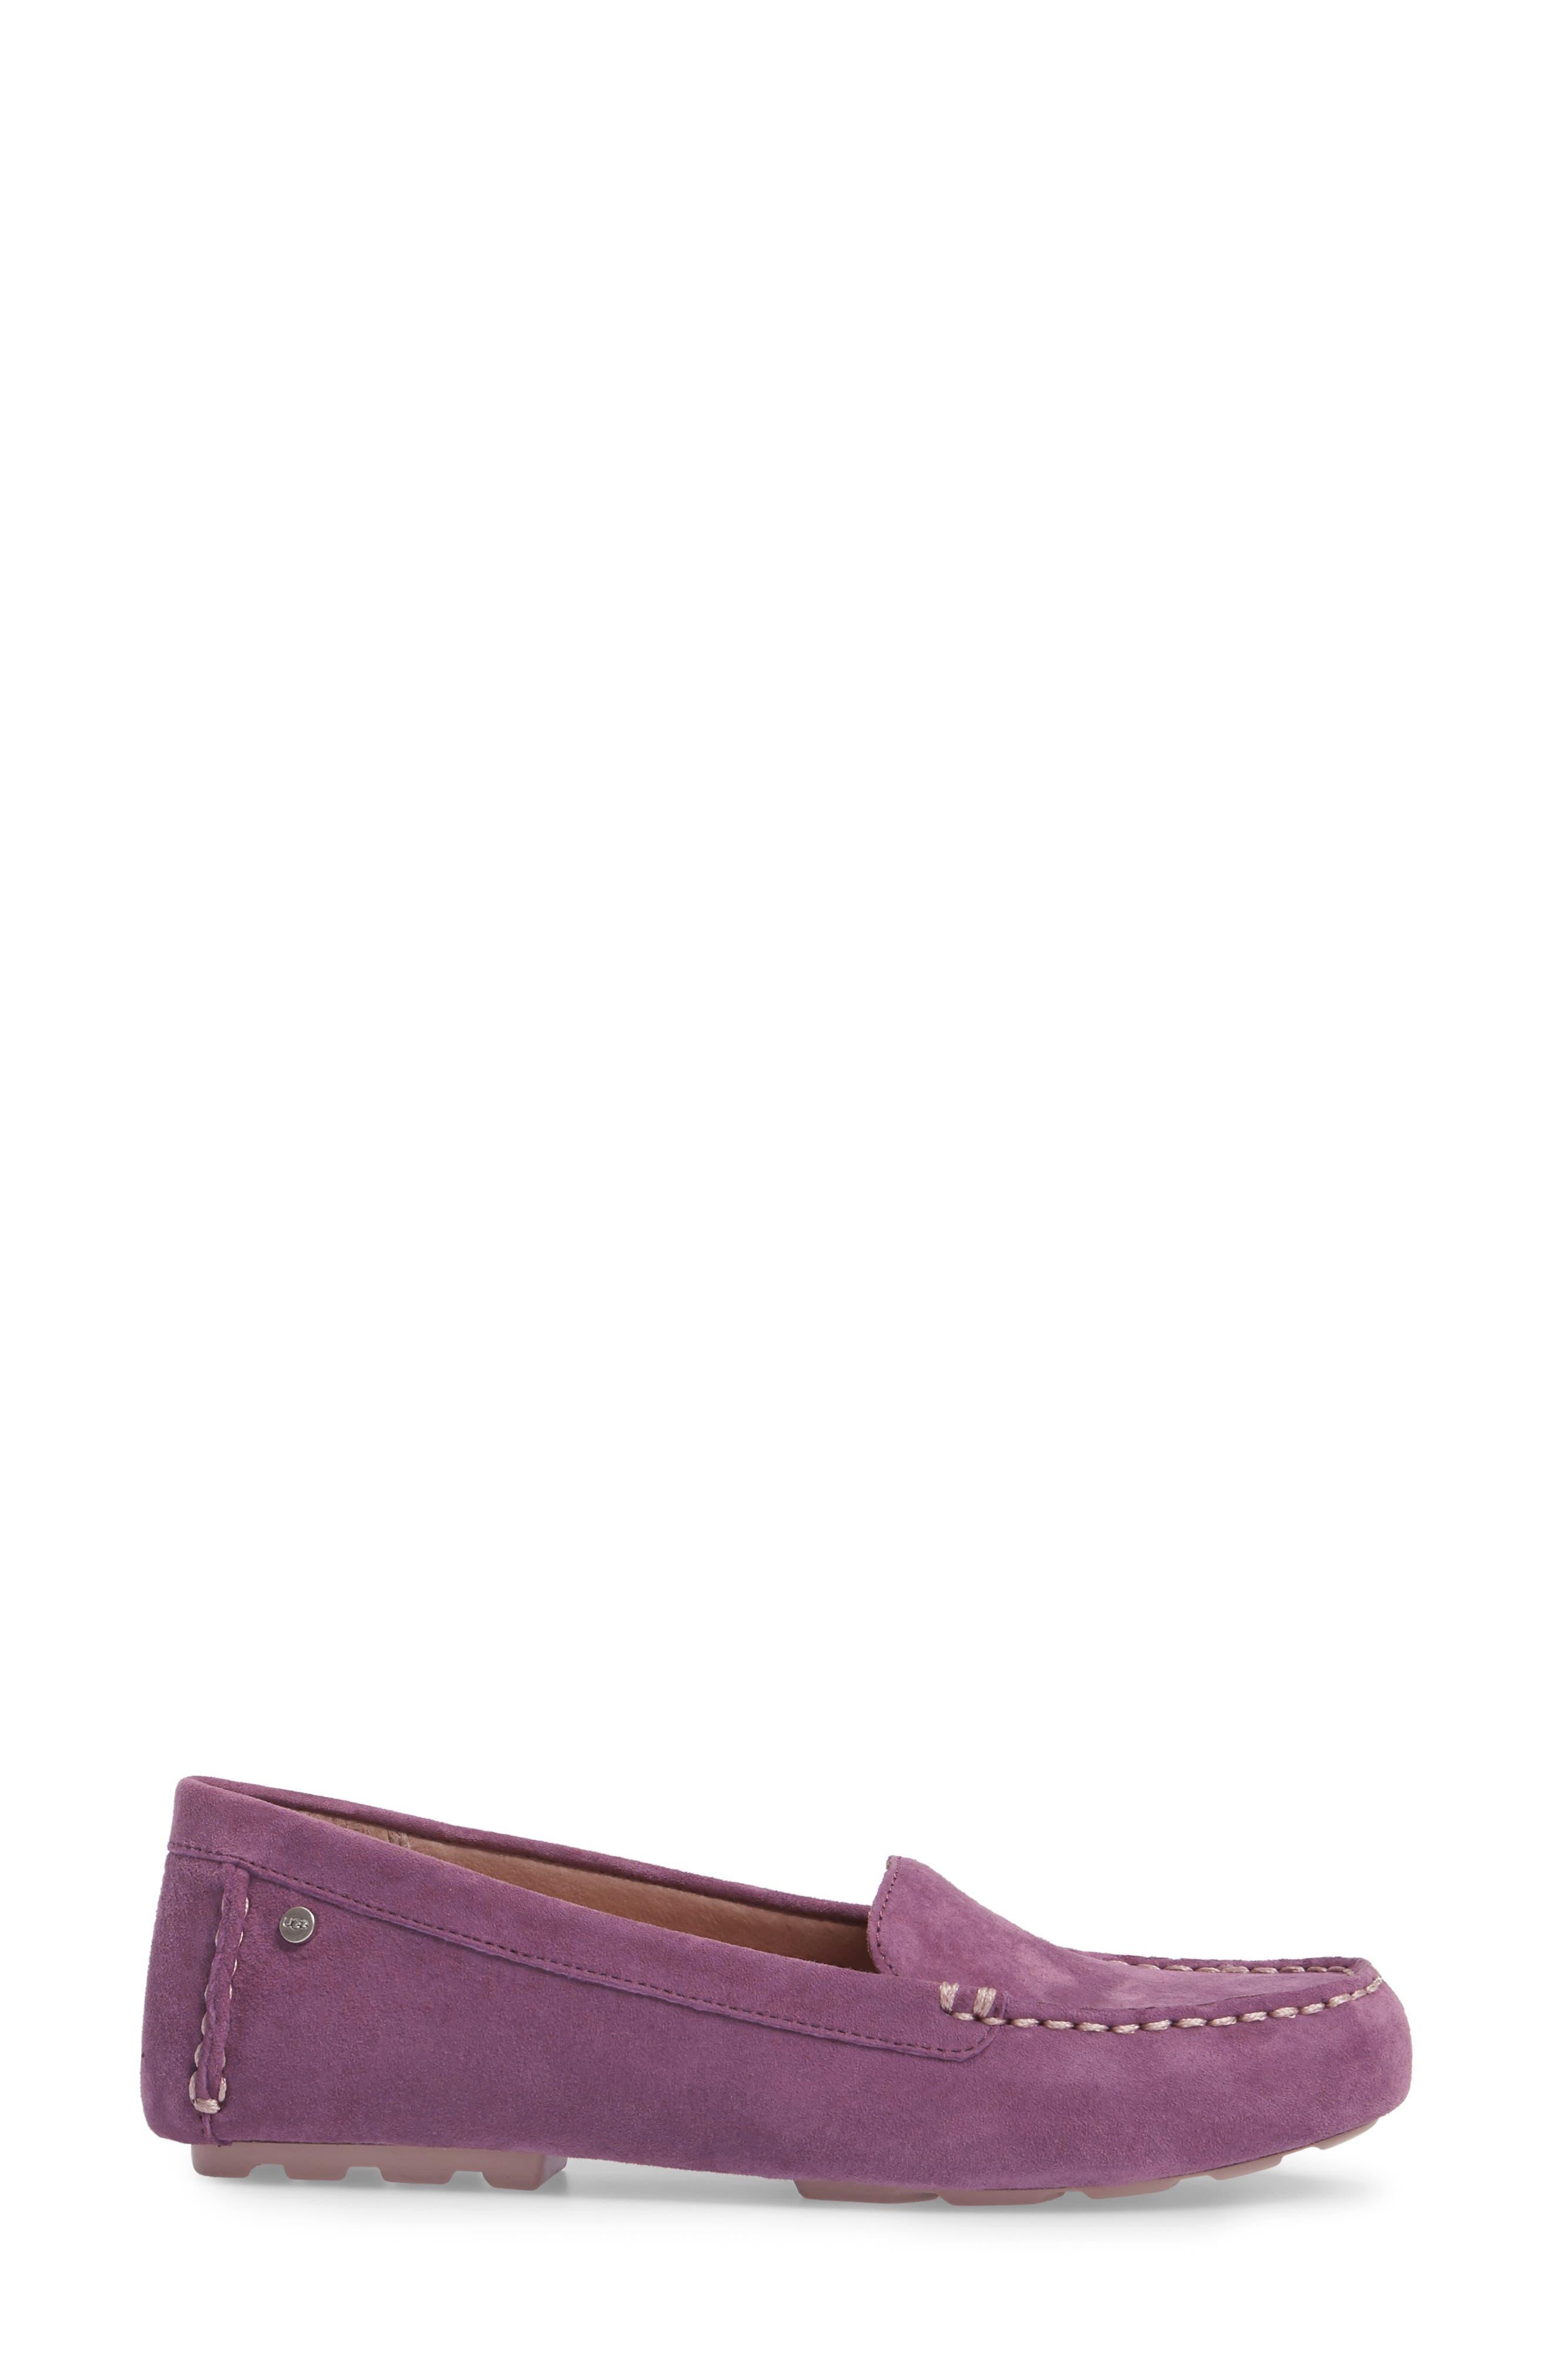 Alternate Image 3  - UGG® Milana Moc Toe Flat (Women)